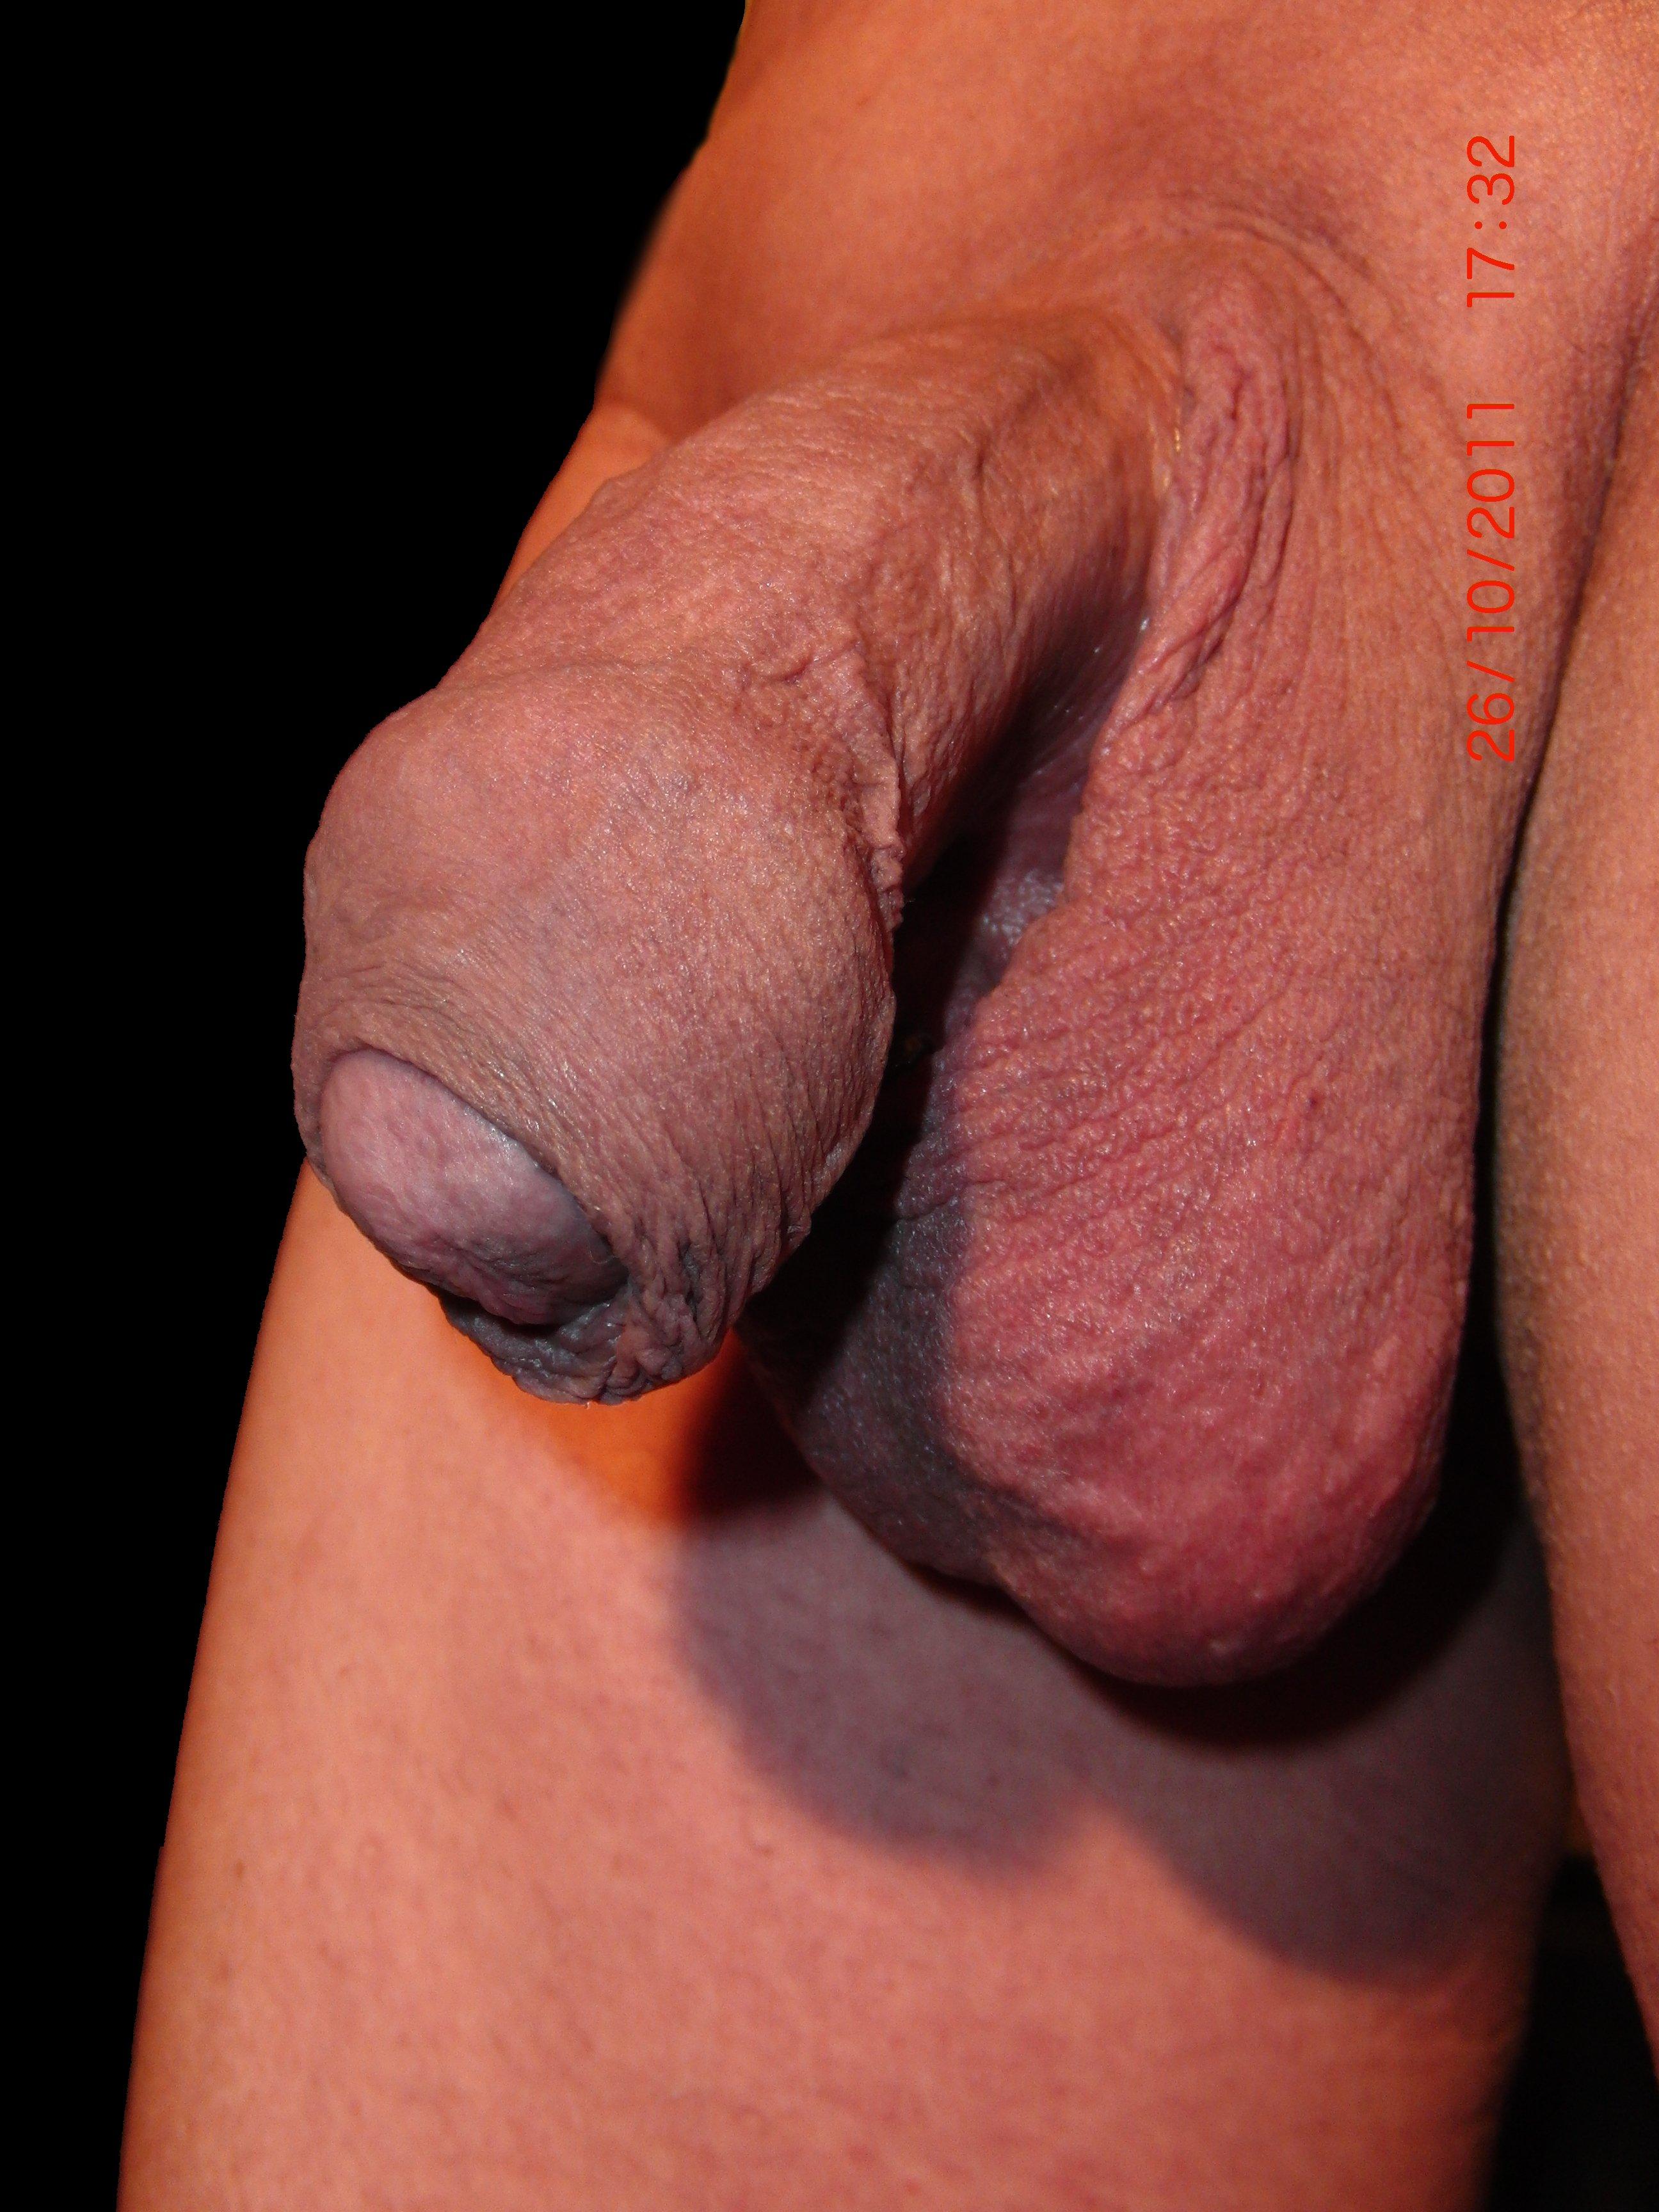 Female masturbation gif